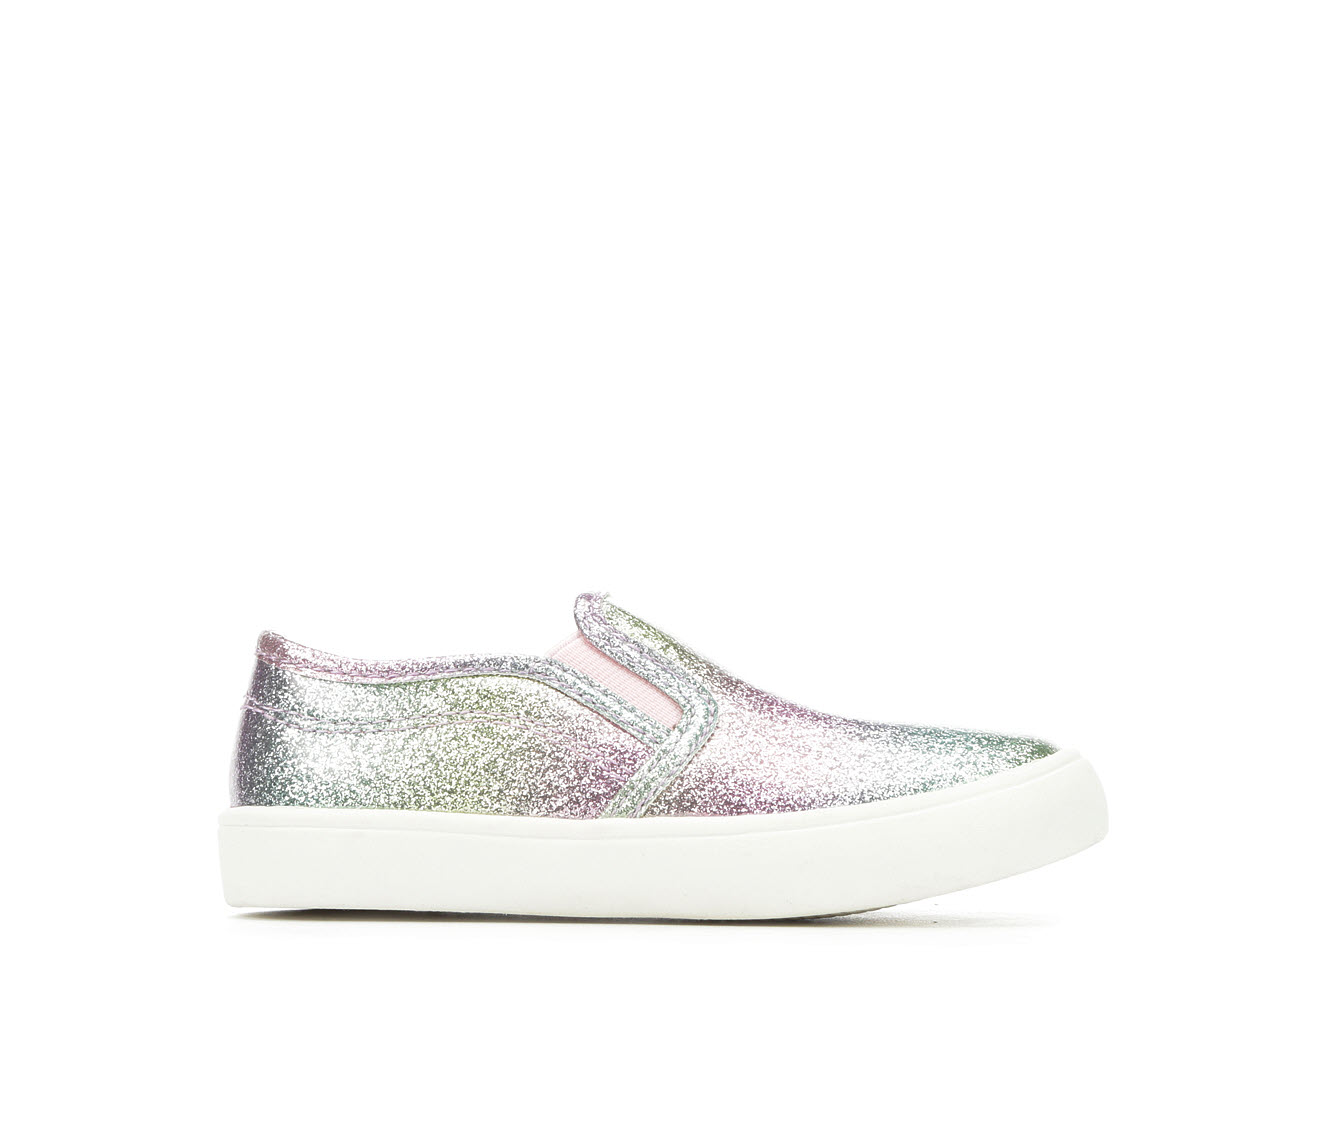 Little Kid Tween 11 Slip-On Shoes